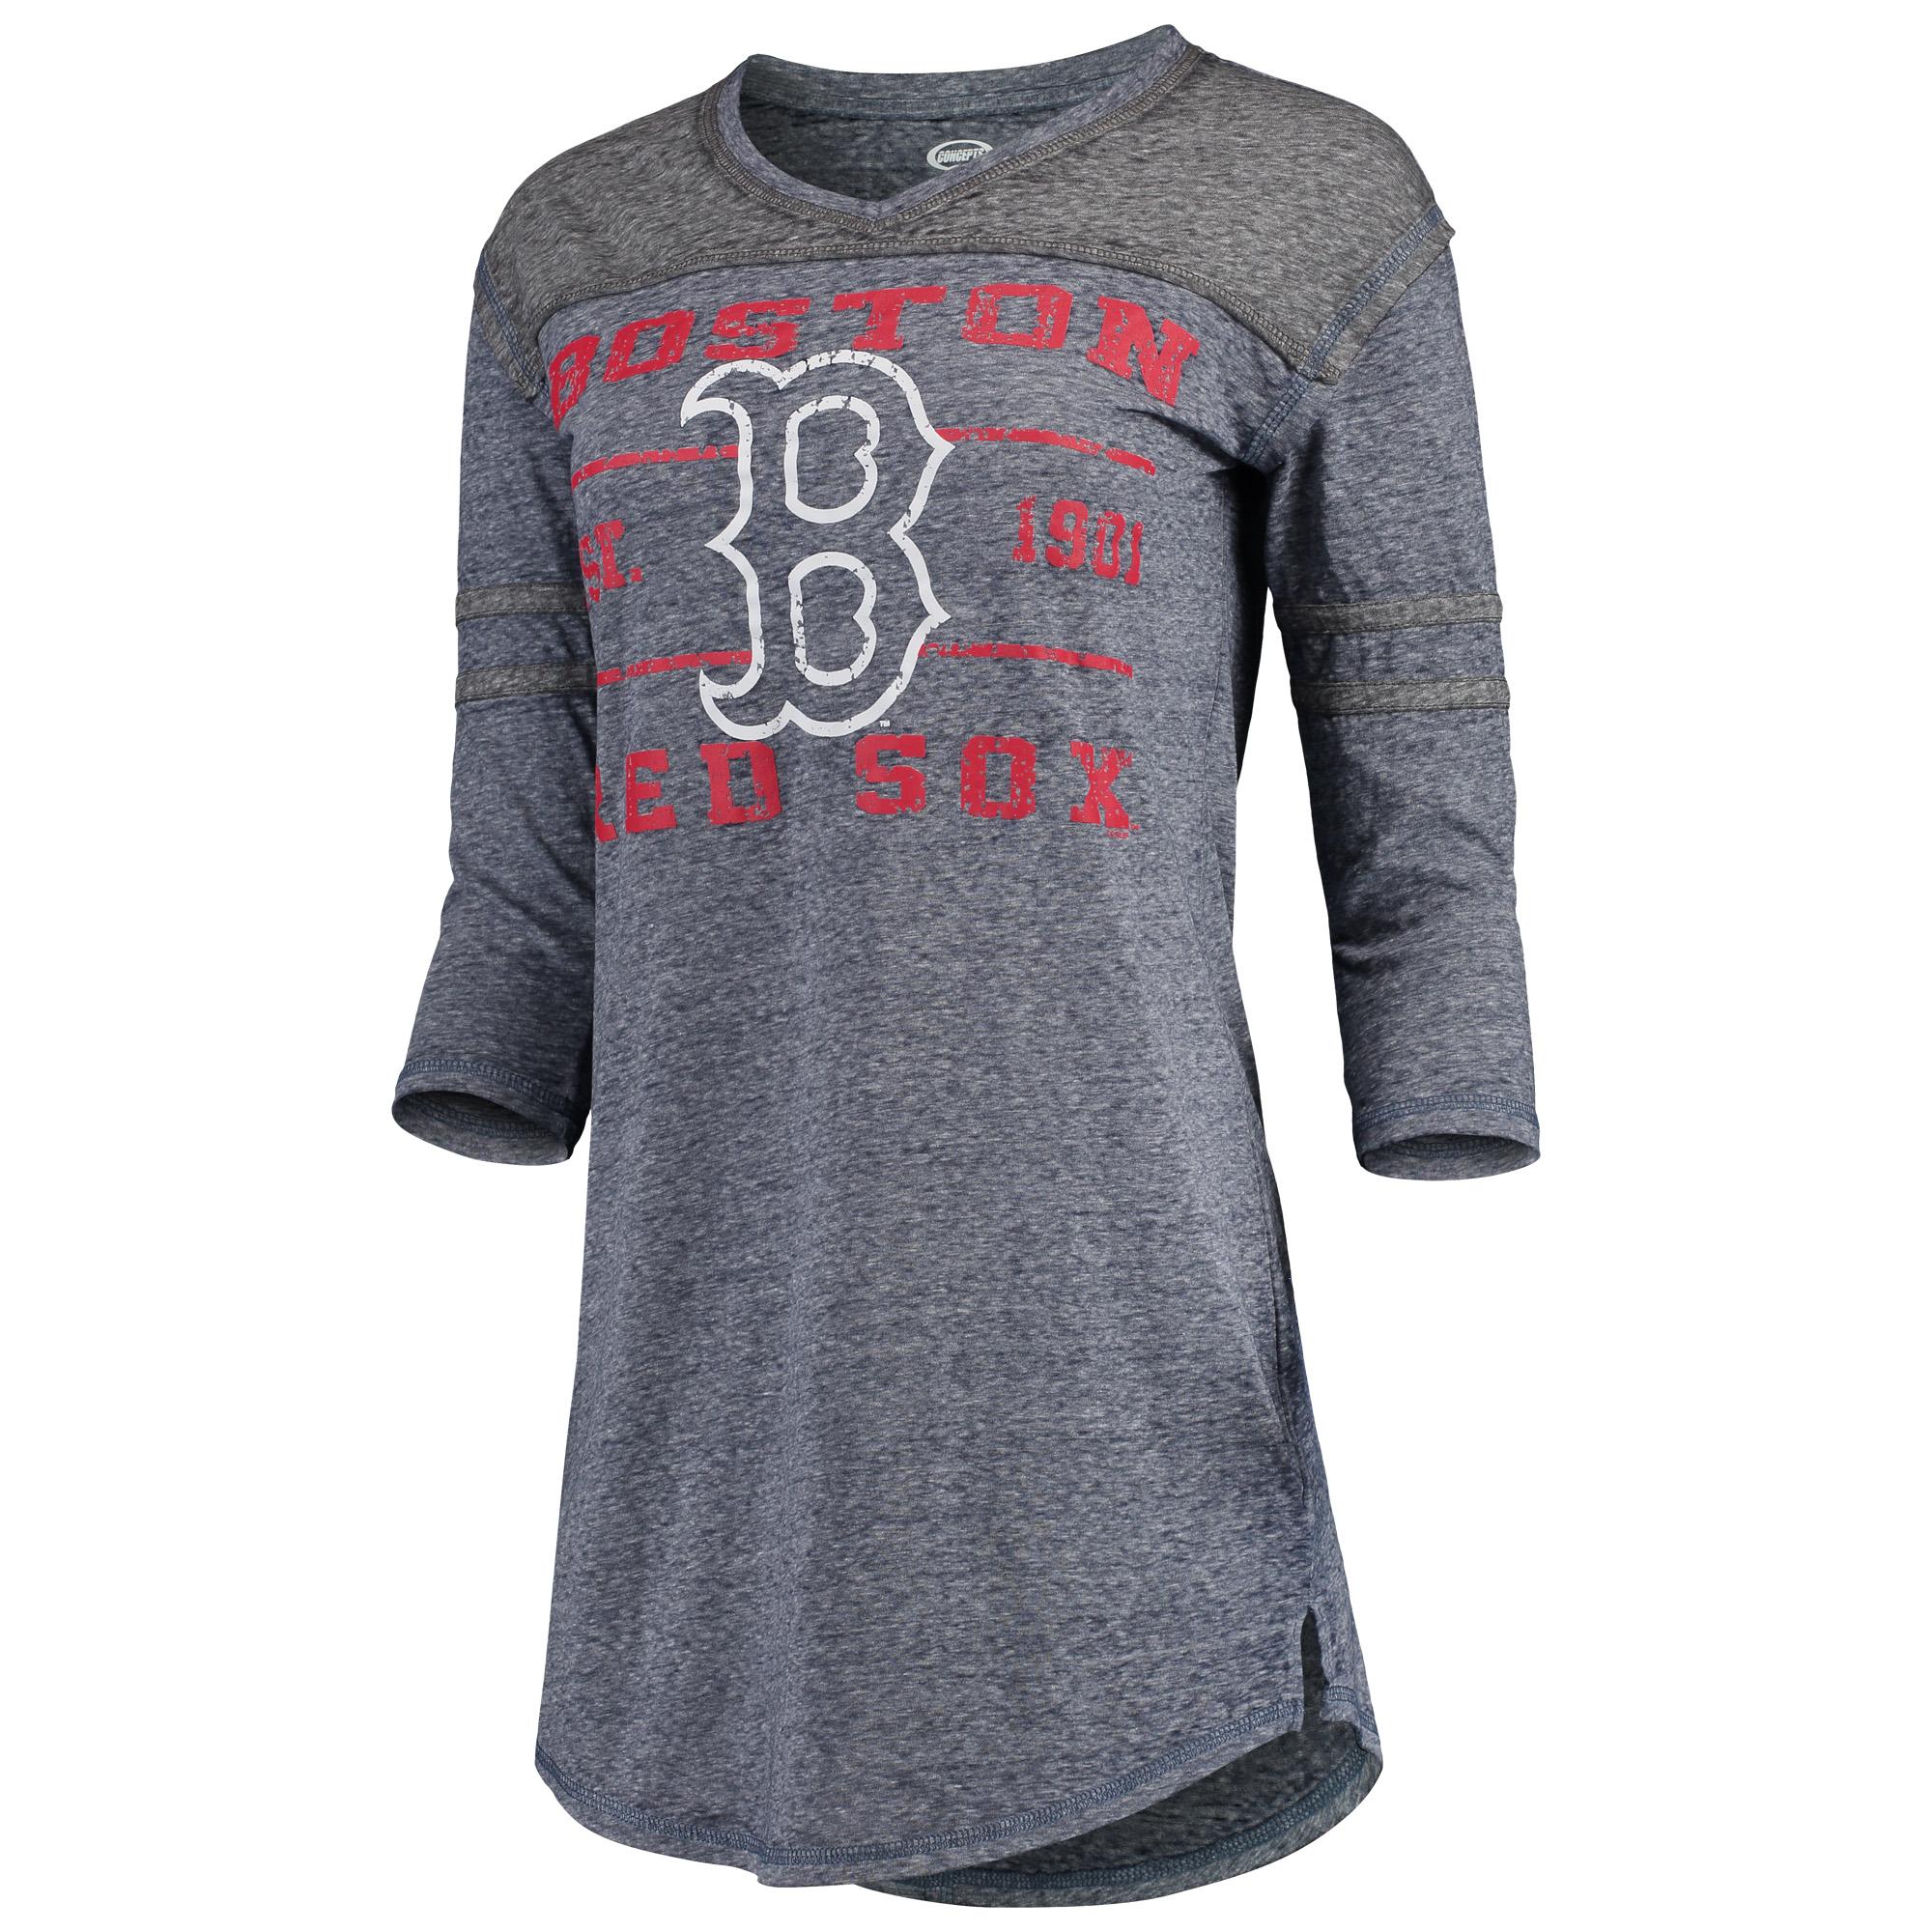 Boston Red Sox Concepts Sport Women's Squad Raglan 3/4-Sleeve Nightshirt - Navy/Charcoal